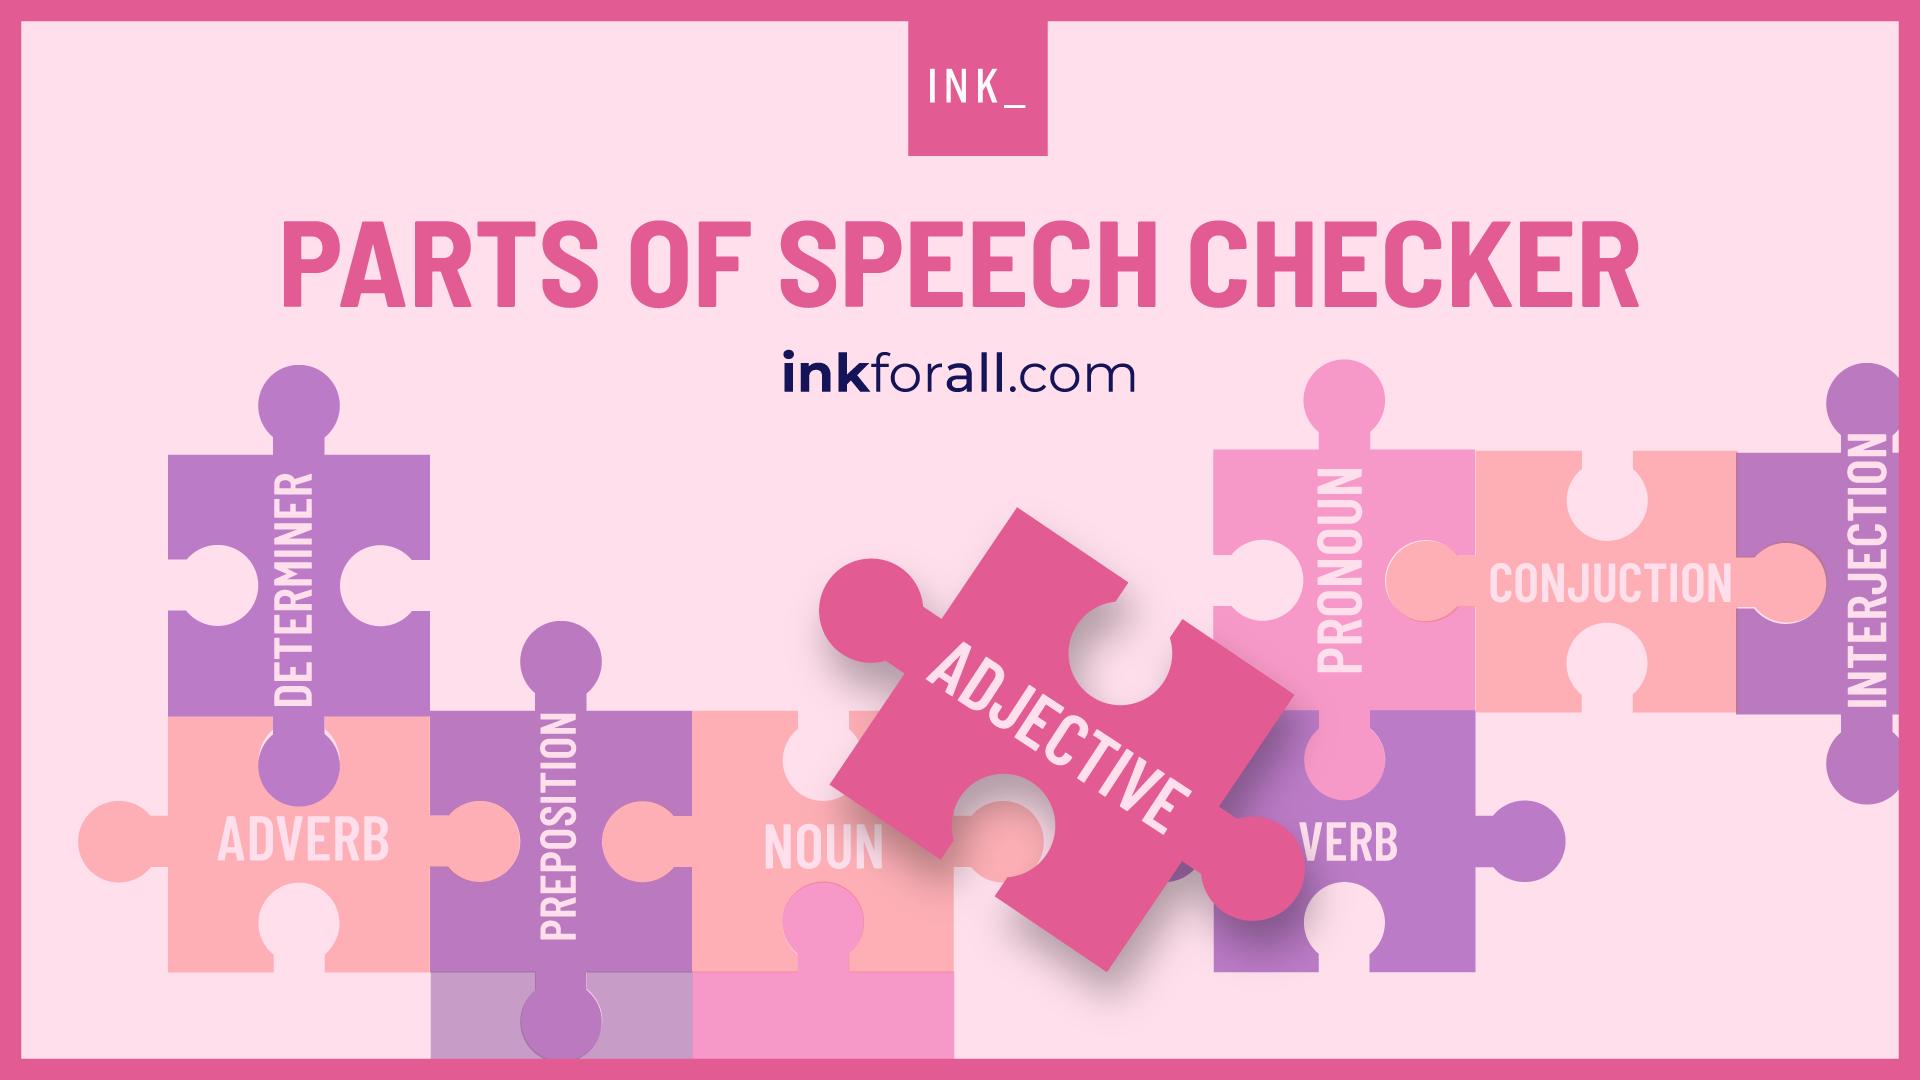 Parts of speech checker